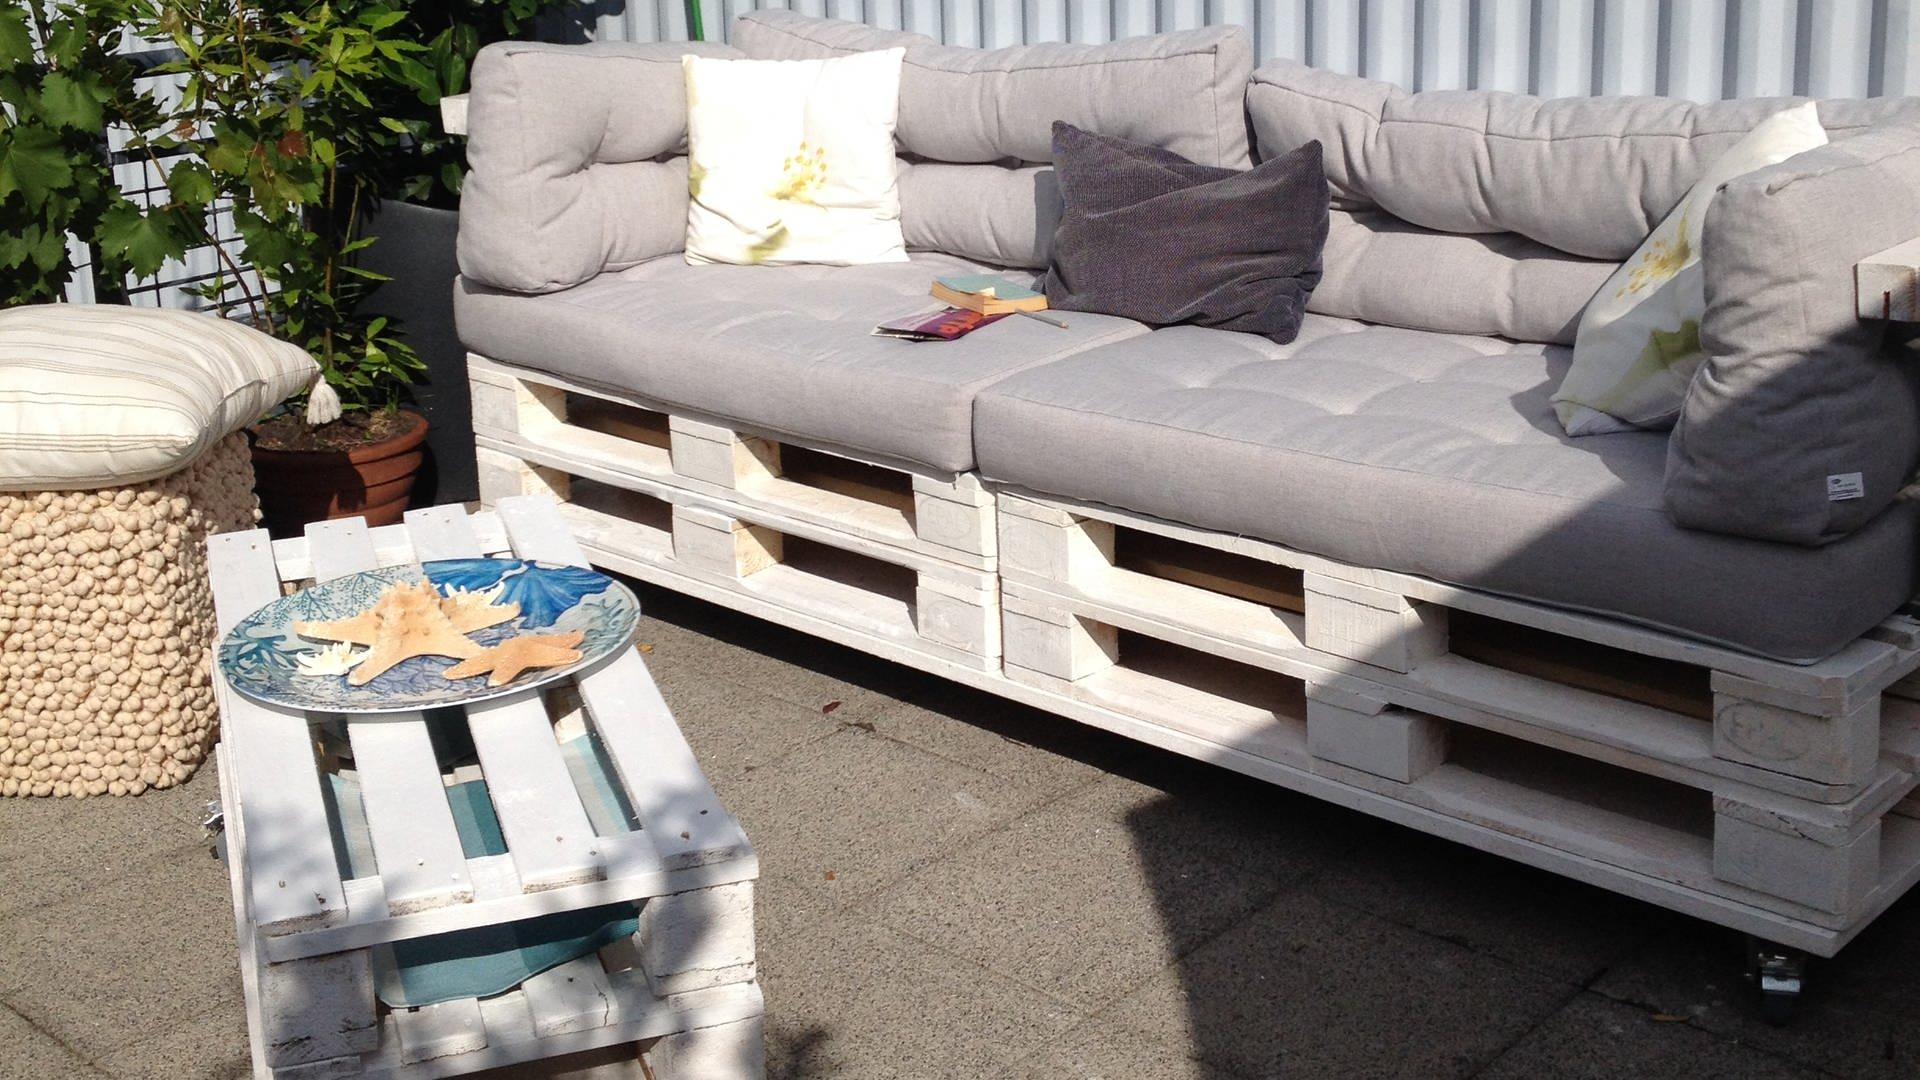 terrassenm bel aus europaletten programm swr1 bw. Black Bedroom Furniture Sets. Home Design Ideas